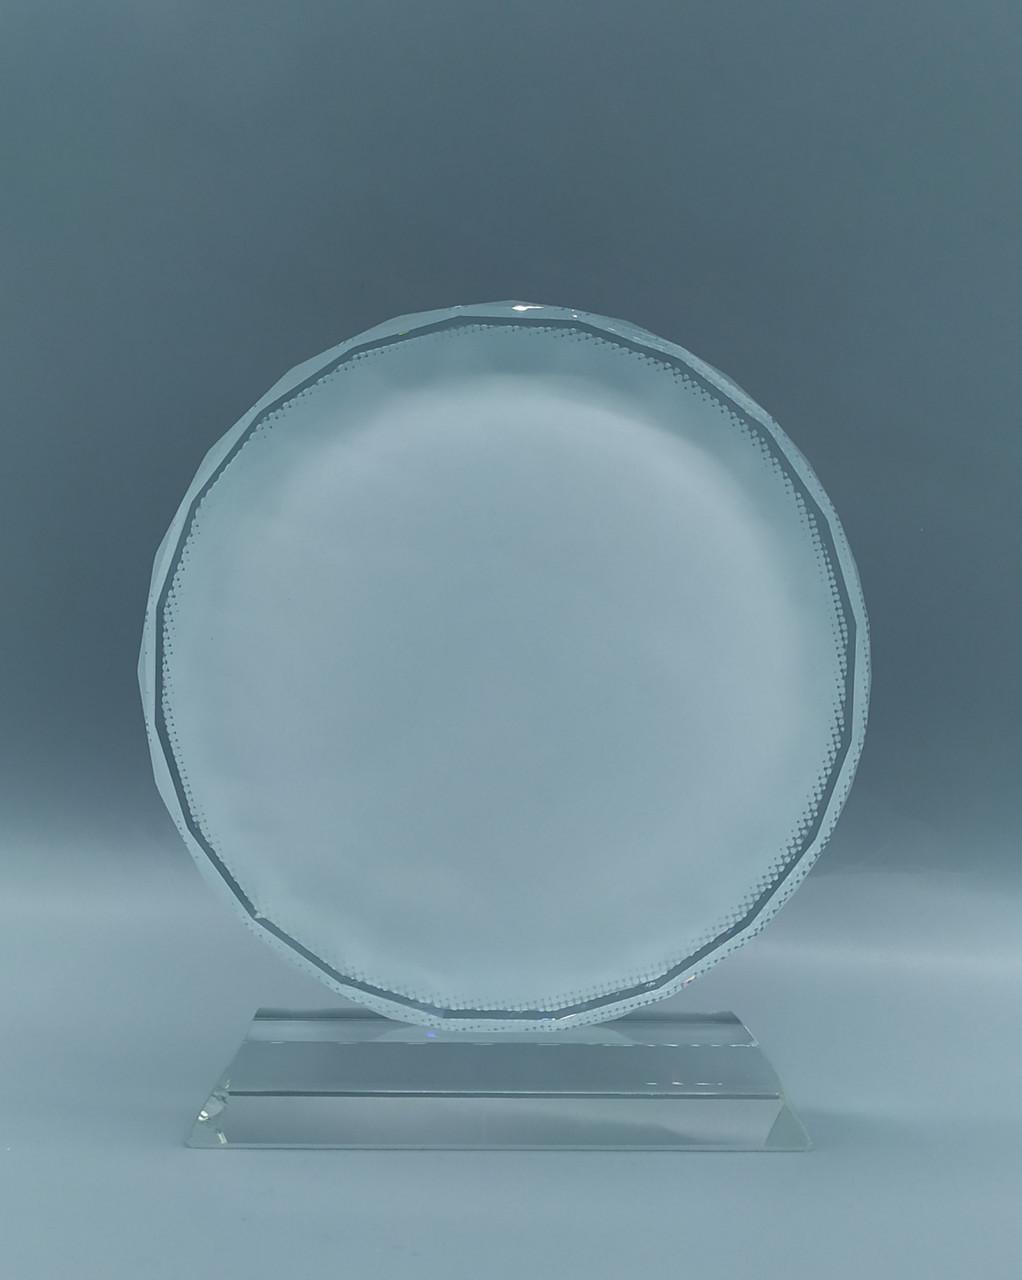 Фотокристалл для сублимации (BSJ 03e),размер - 115*115*15мм